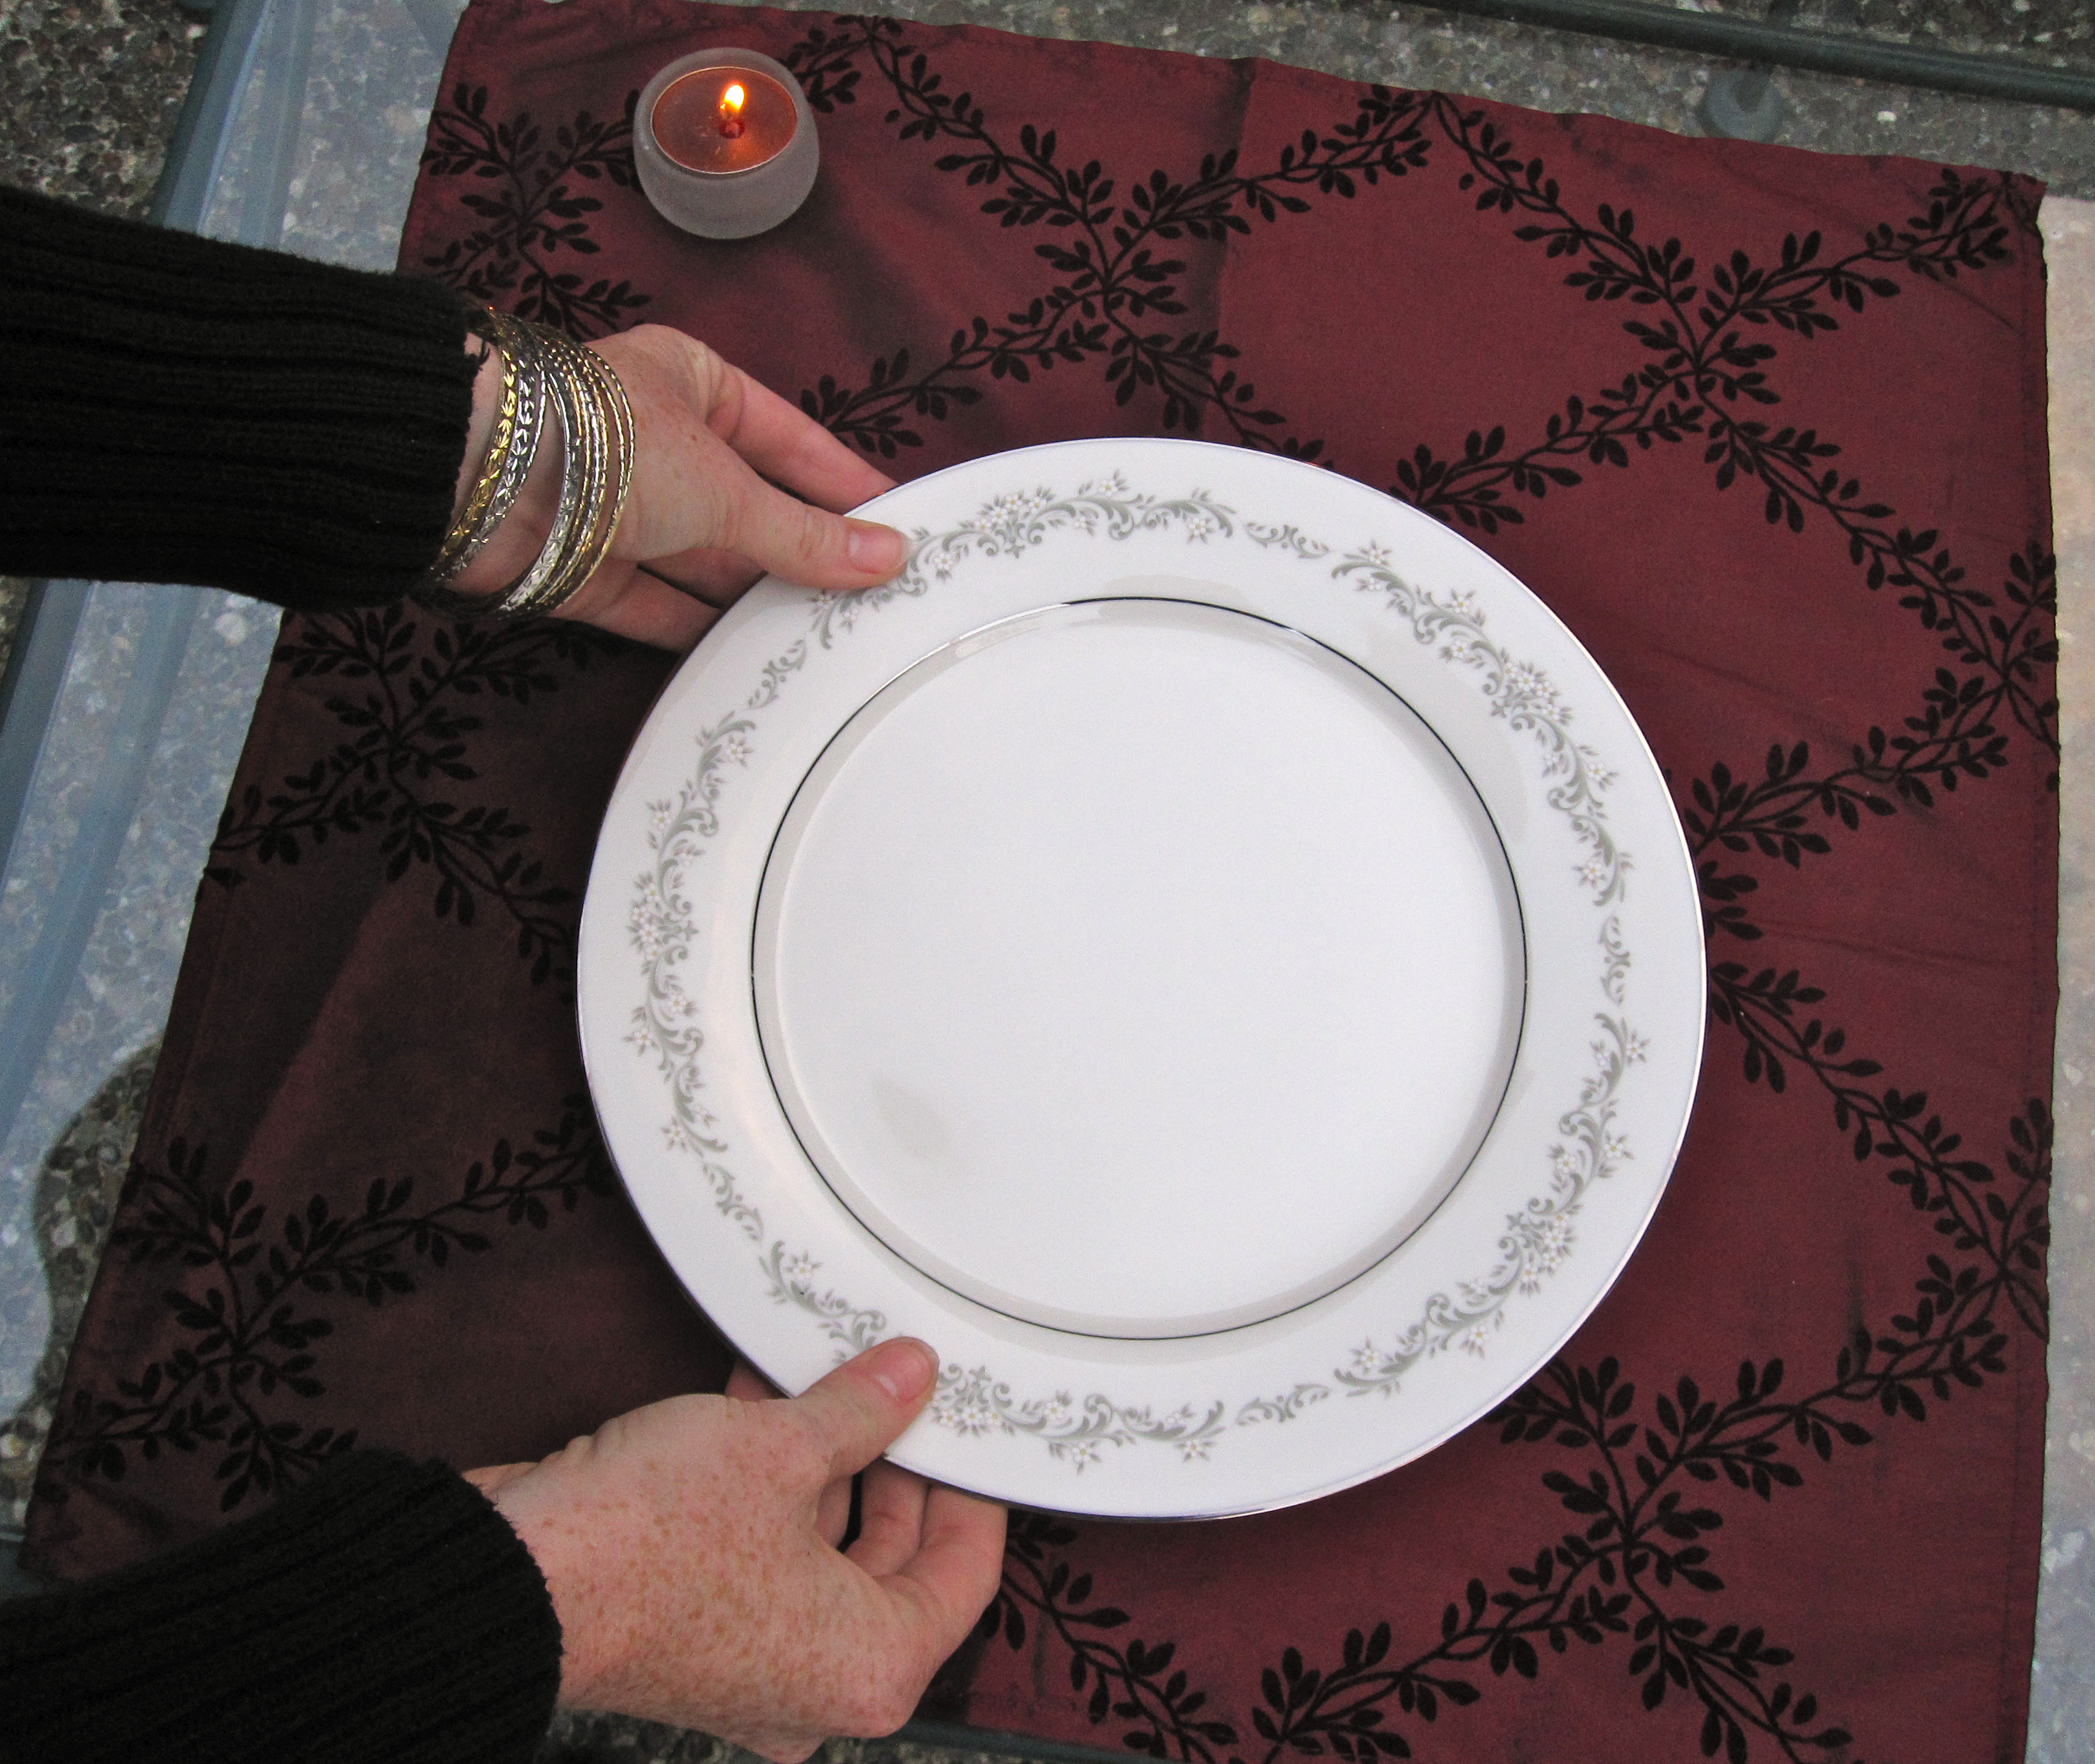 Center your dinner plate.